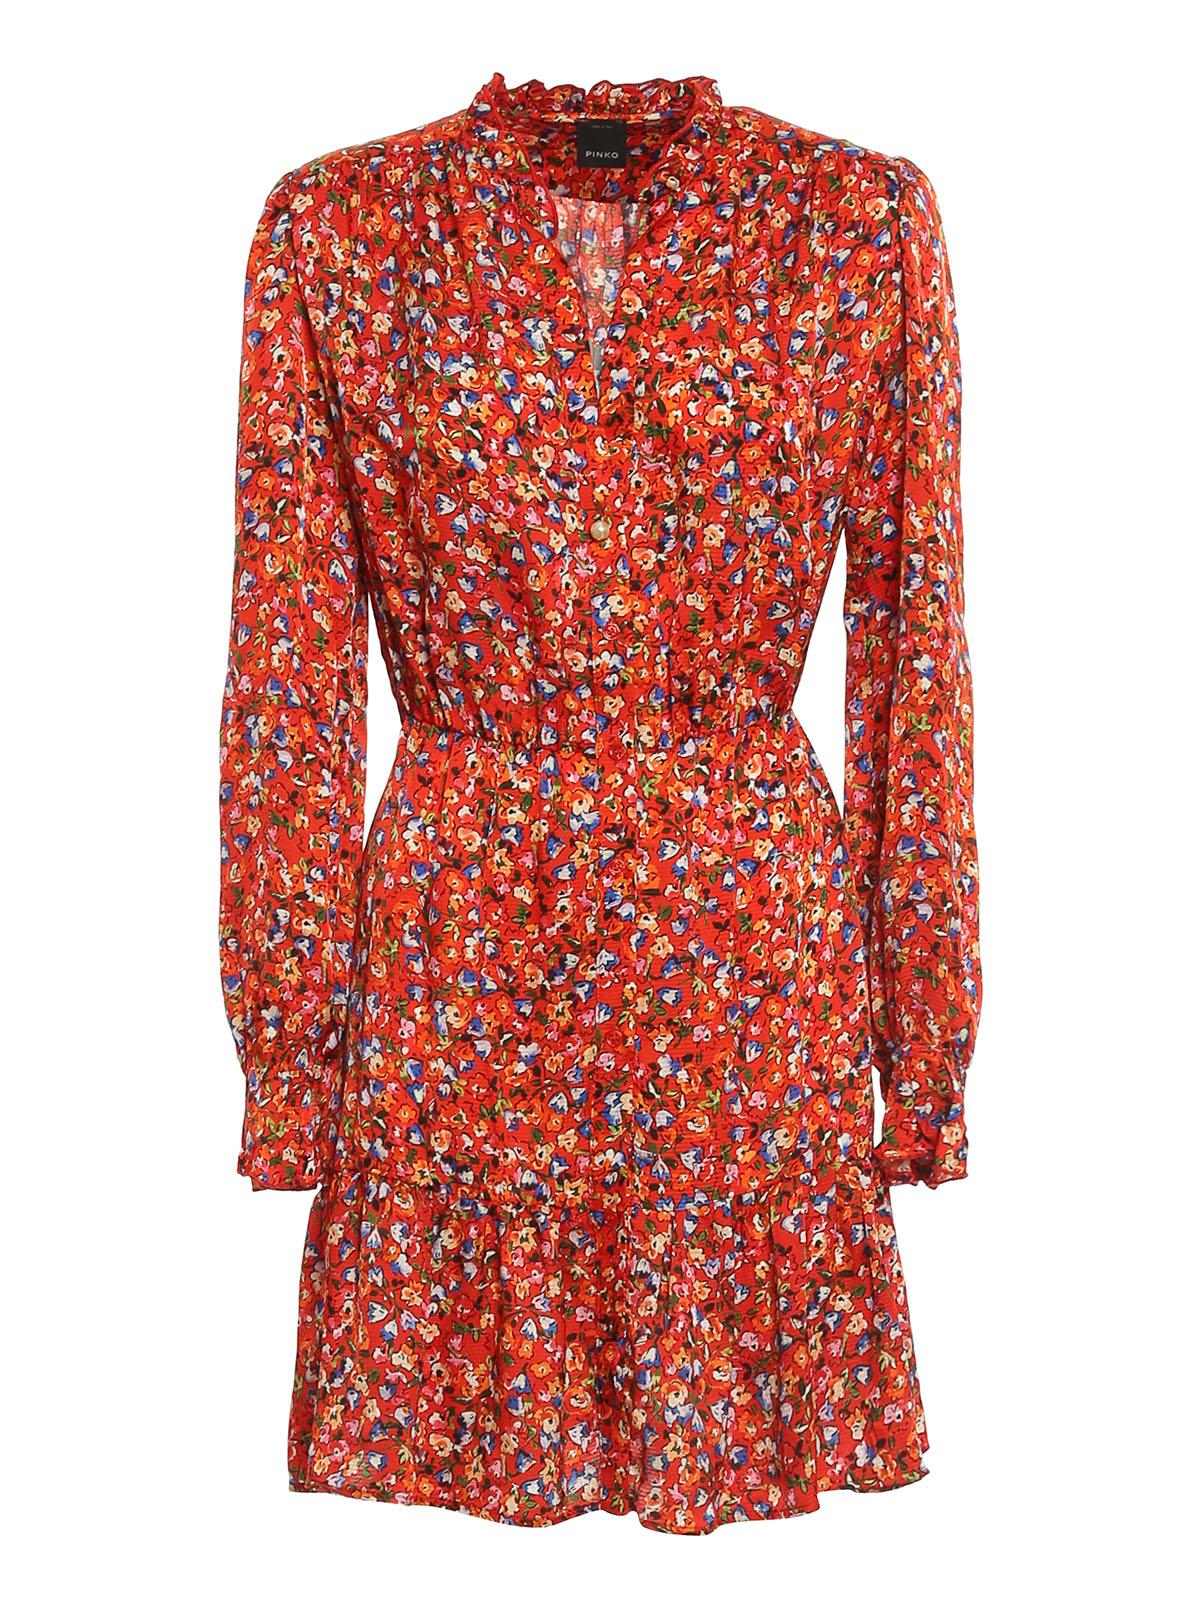 Pinko Downs NOMADE SATIN SHIRT DRESS